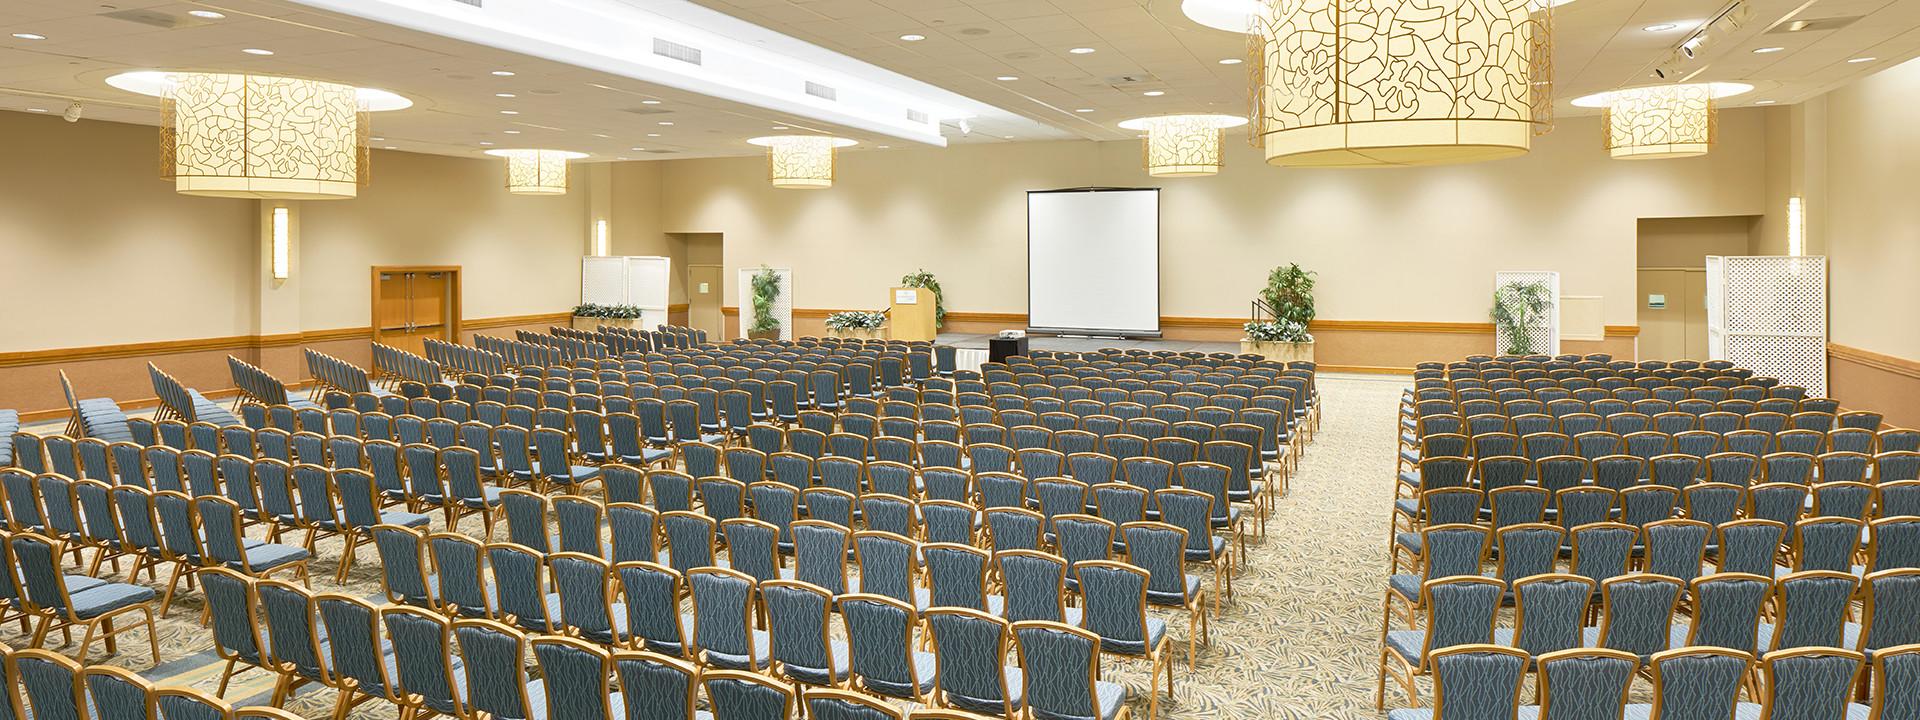 Meeting Conference Spaces Honolulu Ala Moana Hotel